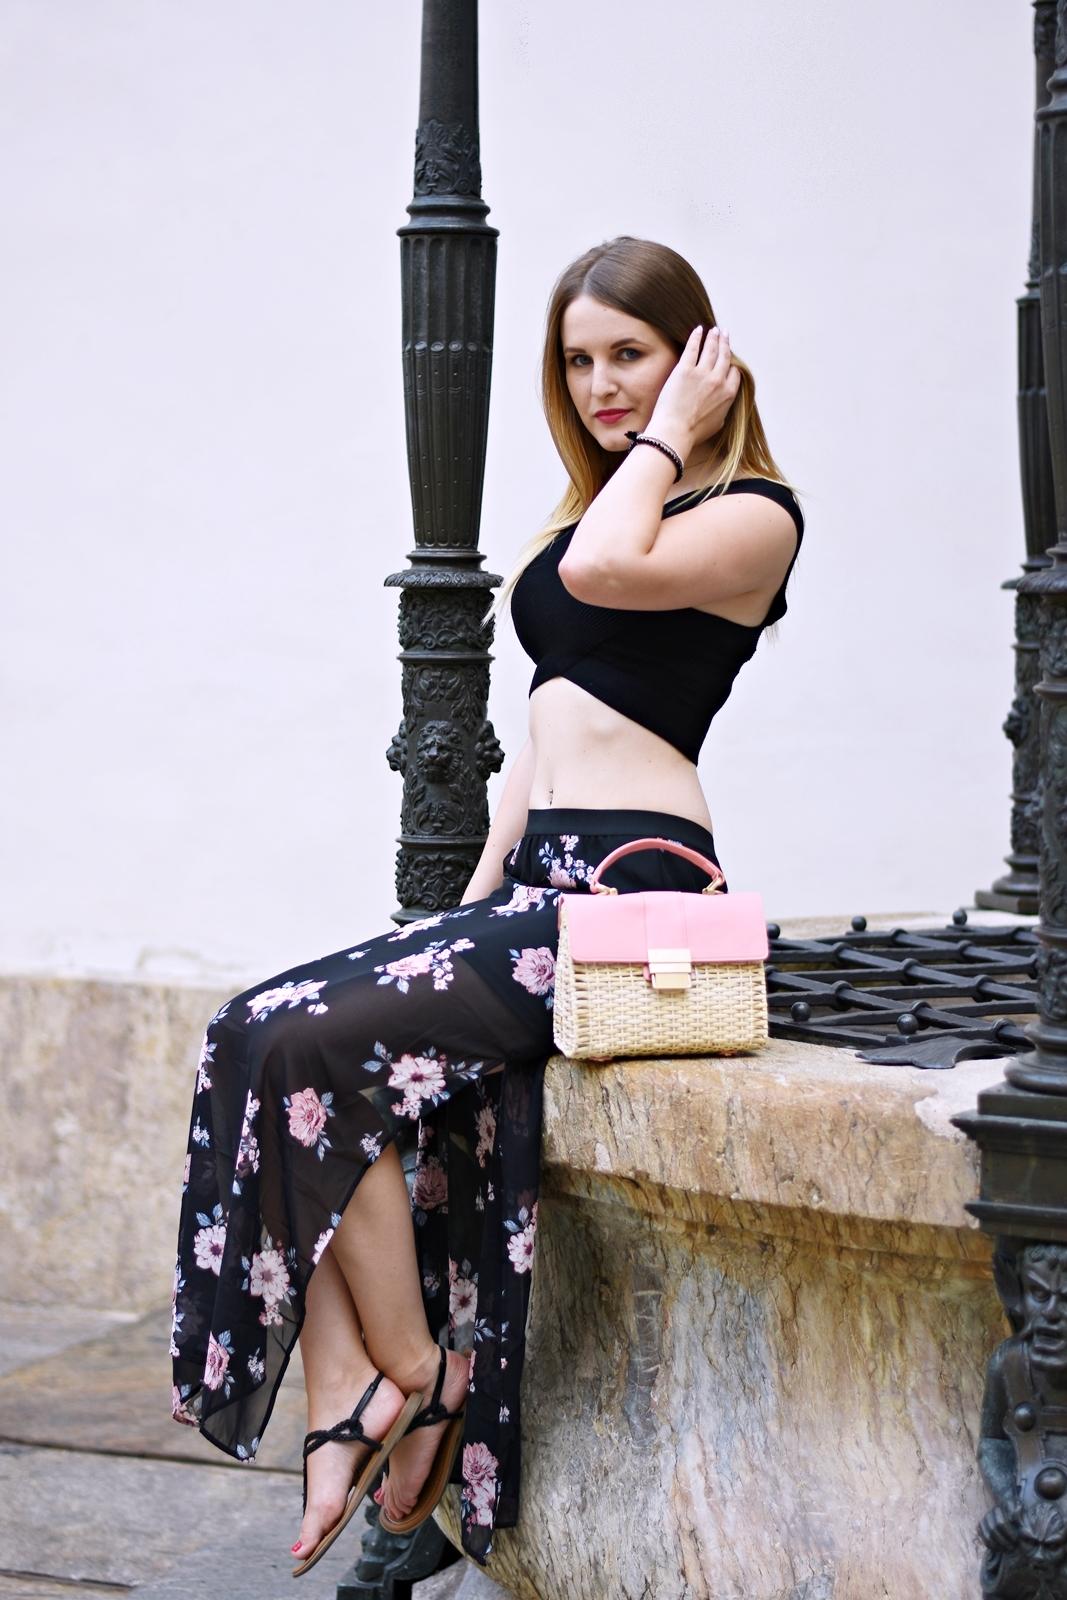 Der Maxirock - Blogparade - Outfit - Fashion - Summer Look - Style - Mode - Crop Top - Korbtasche - Fashionladyloves by Tamara Wagner - Fashionblog - Mode Blog